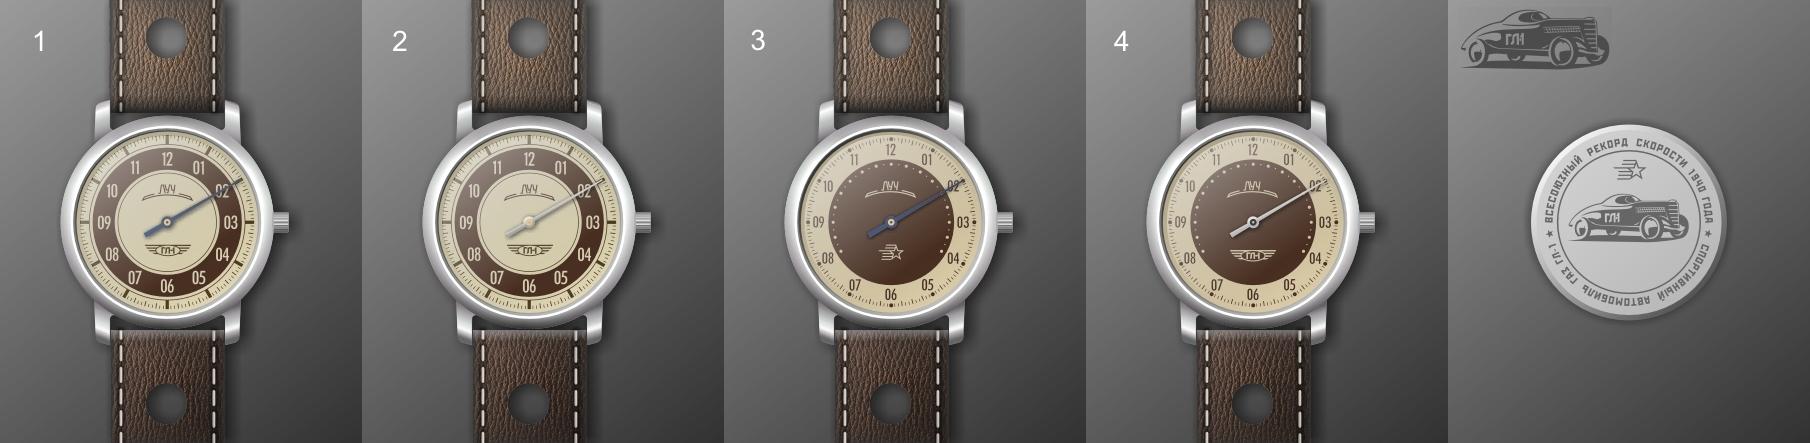 Édition limitée Luch Mono-Aiguilles 1085541d1368636384-best-regards-forum-watch-ru-limited-single-hand-timepiece-luch-1953-2013-1-4-